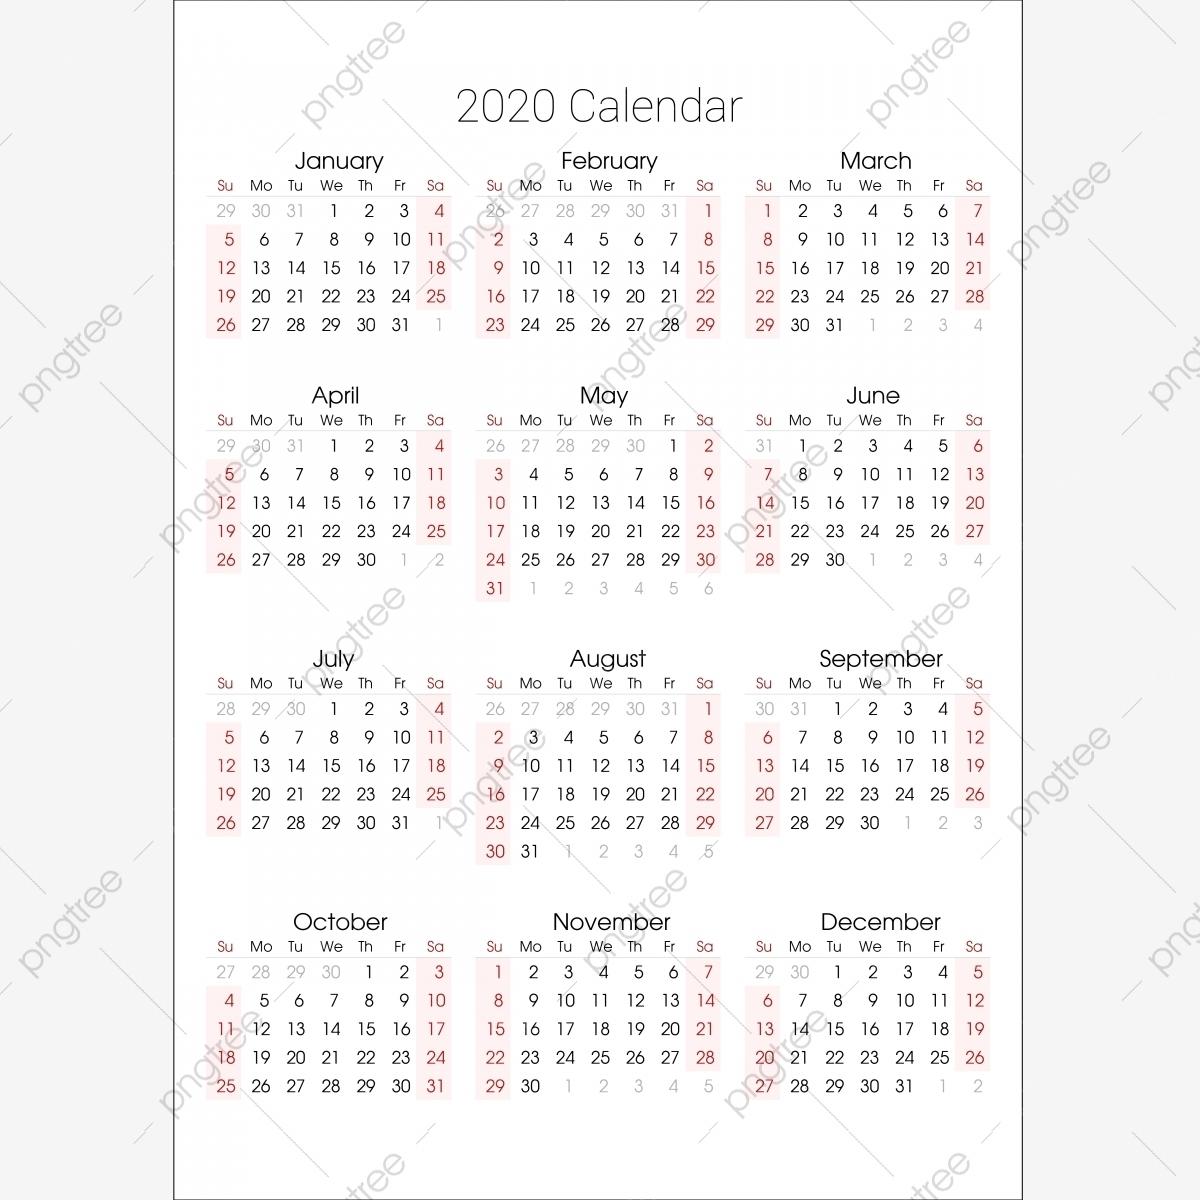 2020 Calendar Illustrator File, 2020, Calander, Calander